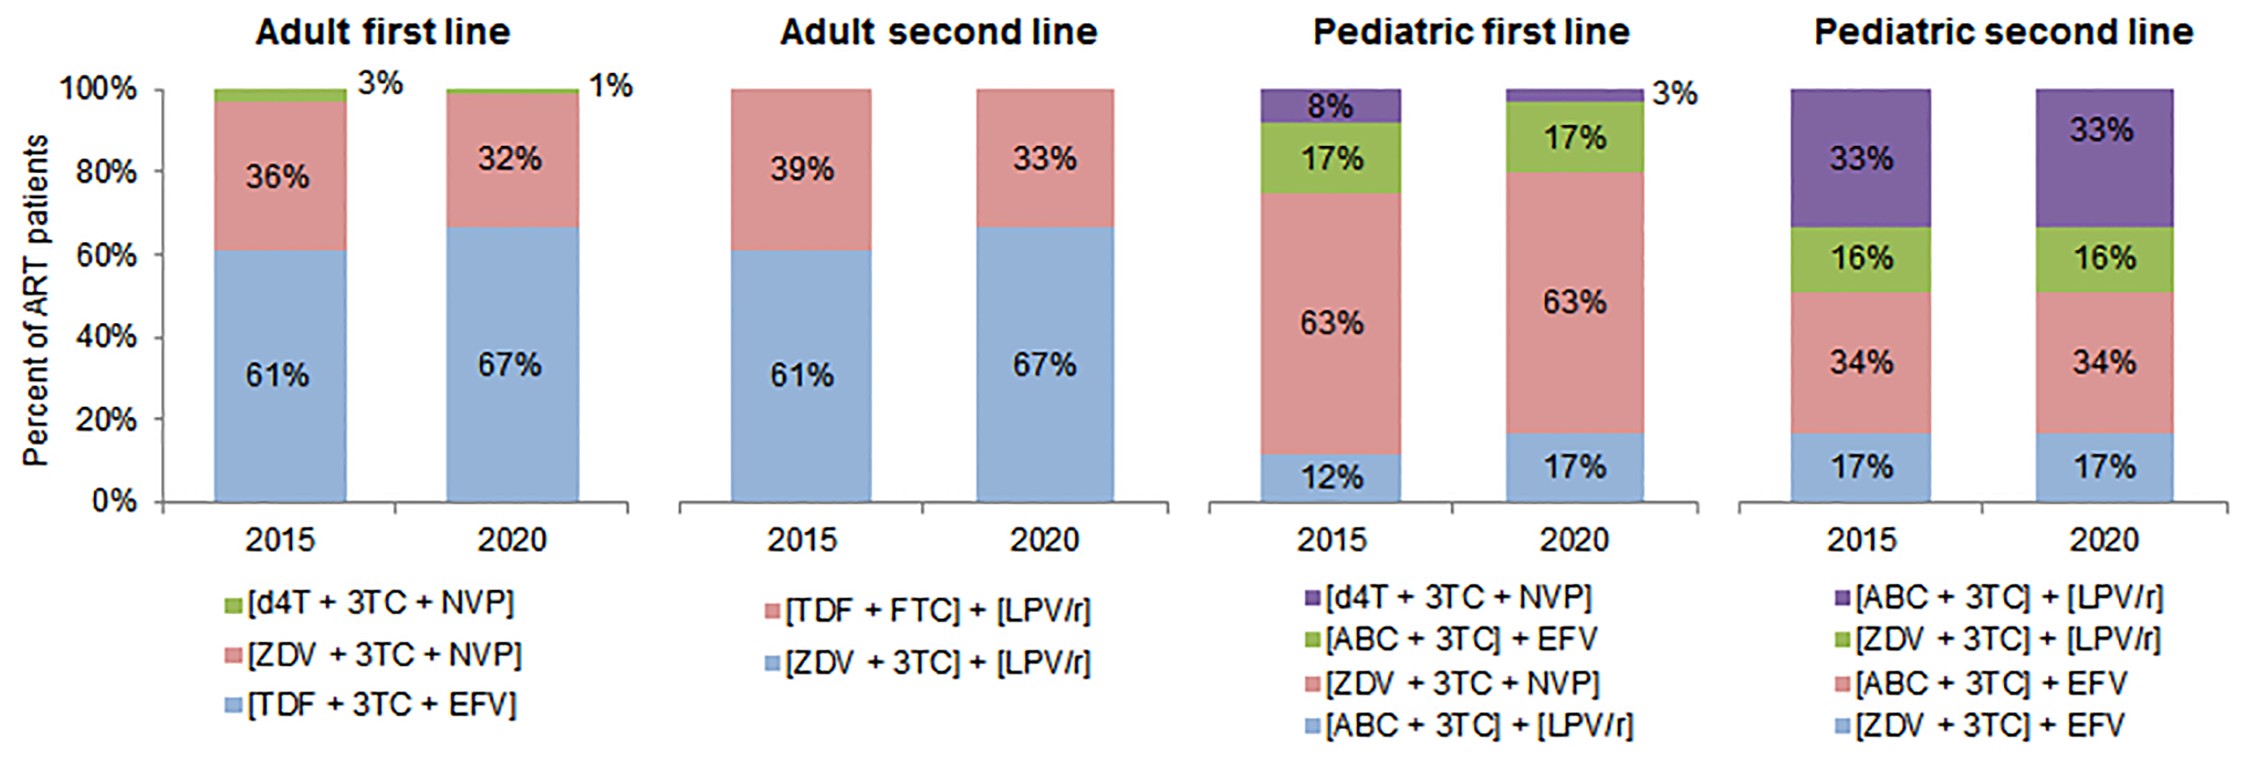 Antiretroviral regimens used in cost calculations.